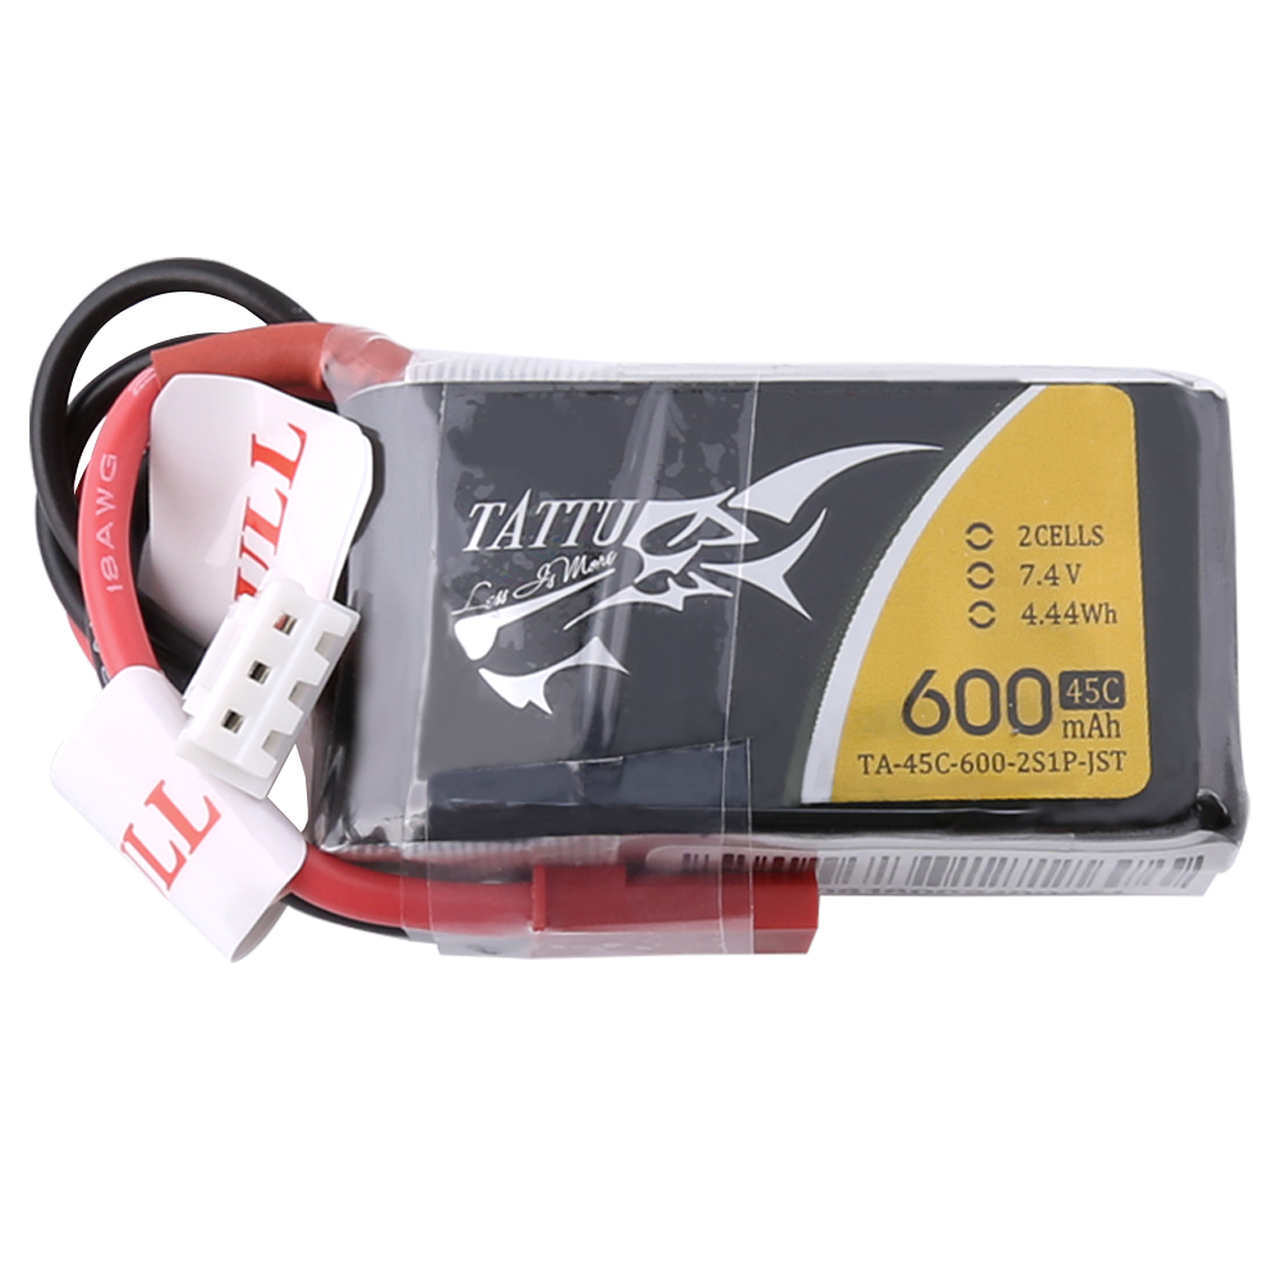 Tattu 600mAh 7.4V 45C 2S1P Lipo Battery Pack with JST-SYP Plug